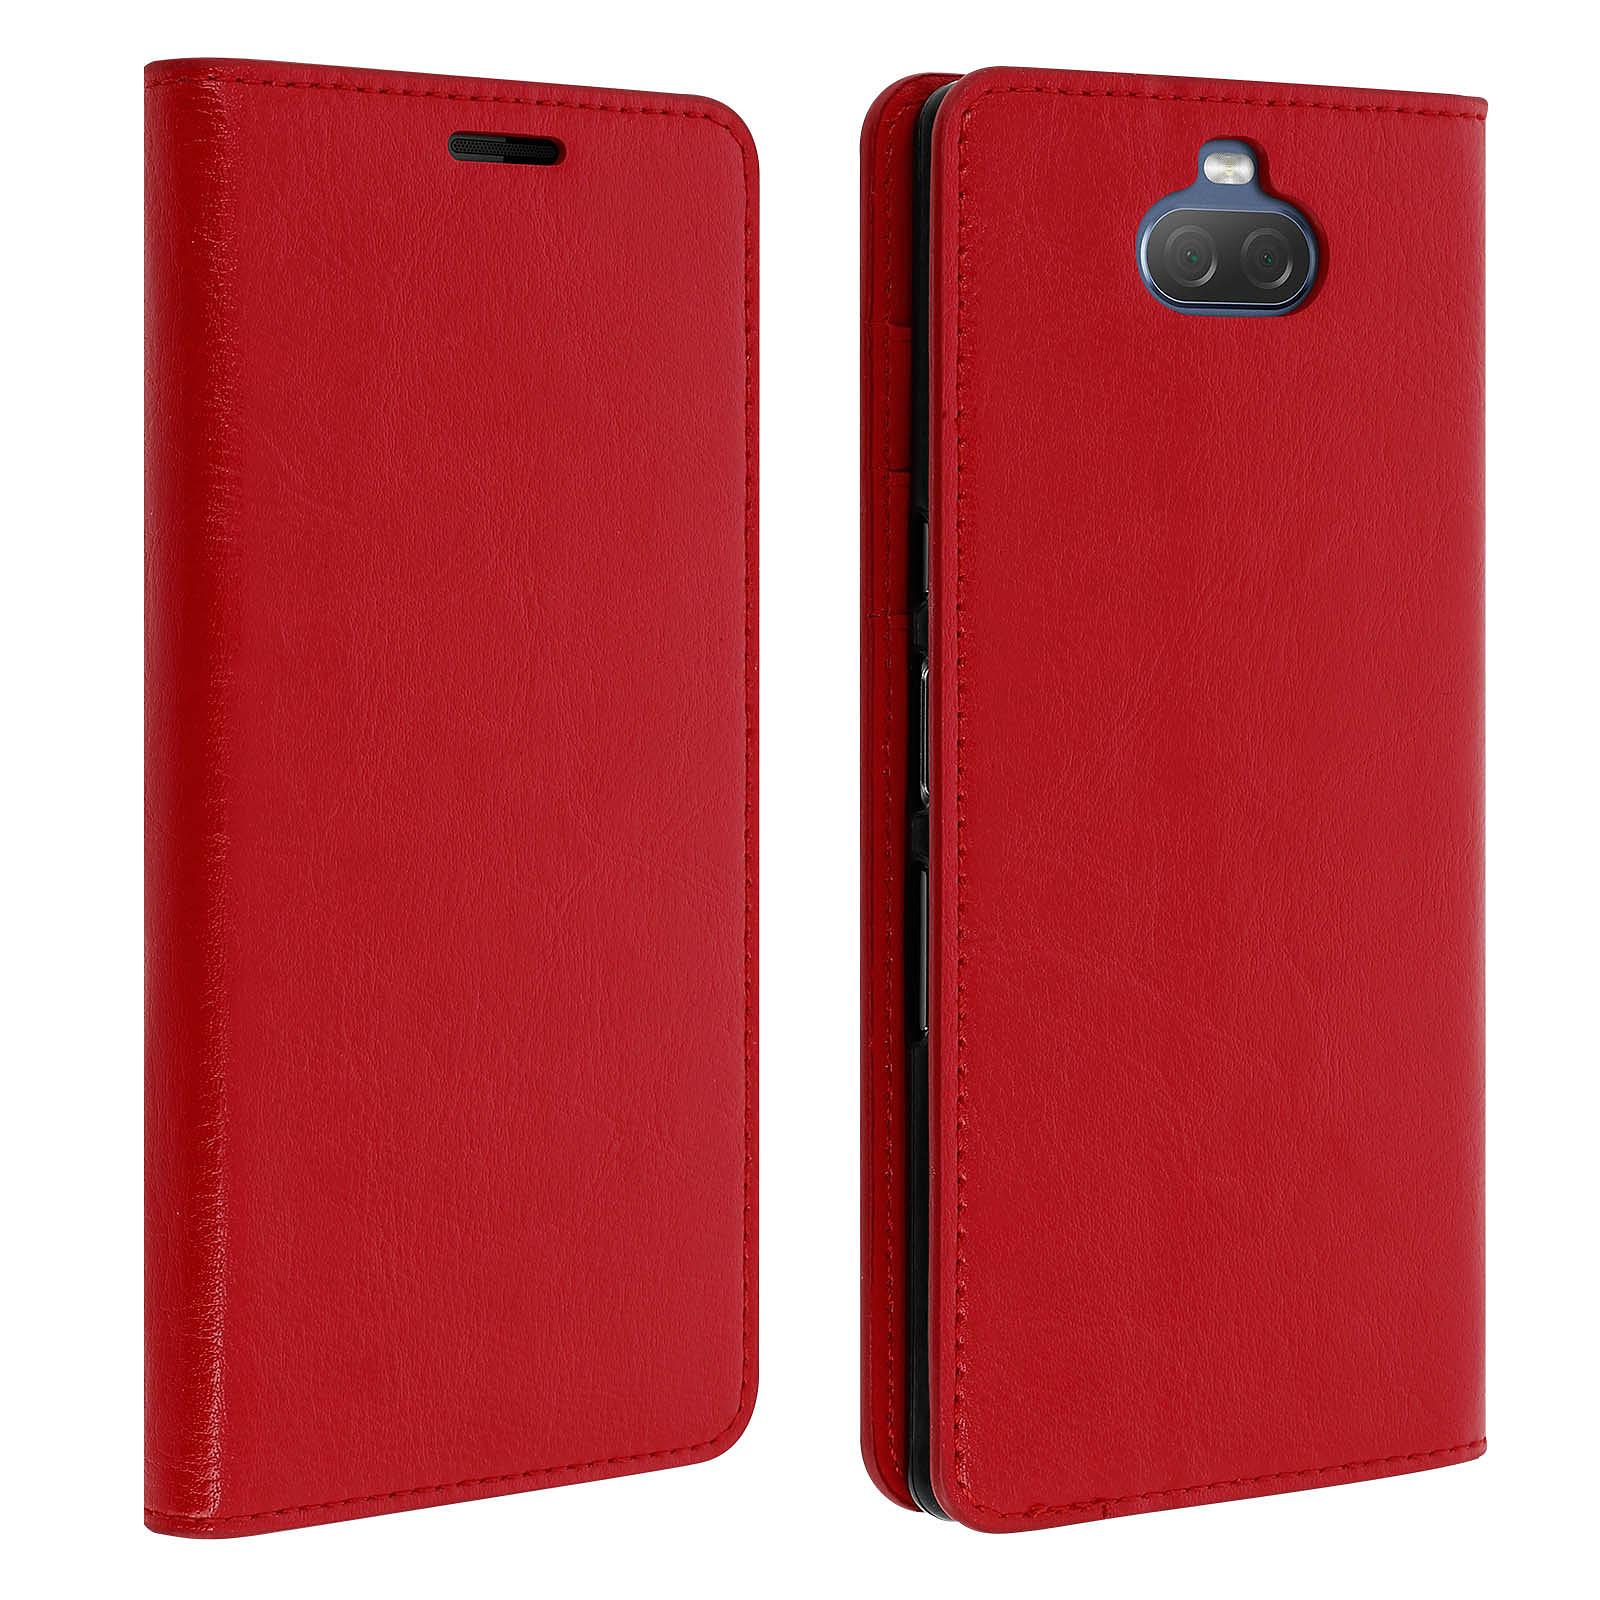 Avizar Etui folio Rouge pour Sony Xperia 10